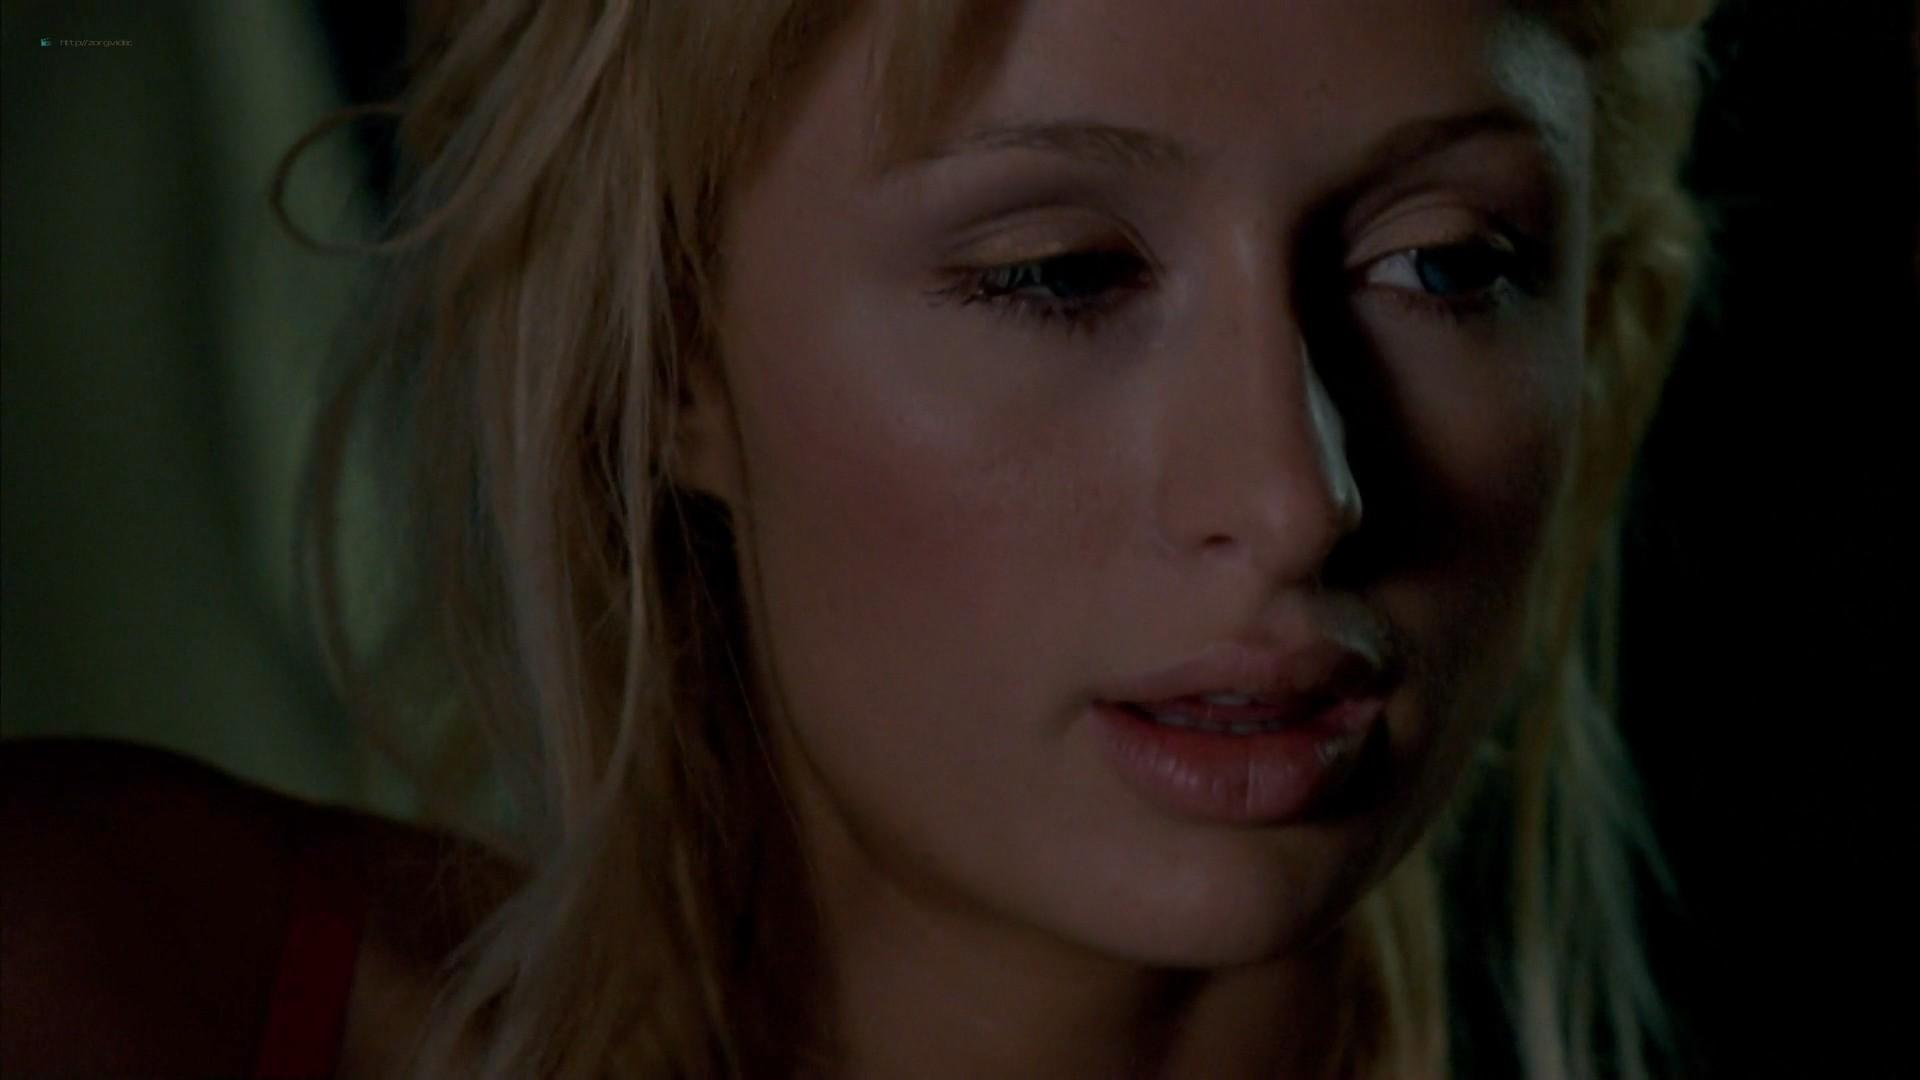 Elisha Cuthbert hot cleavage Paris Hilton striping to bra and panties - House of Wax (2005) HD 1080p (2)